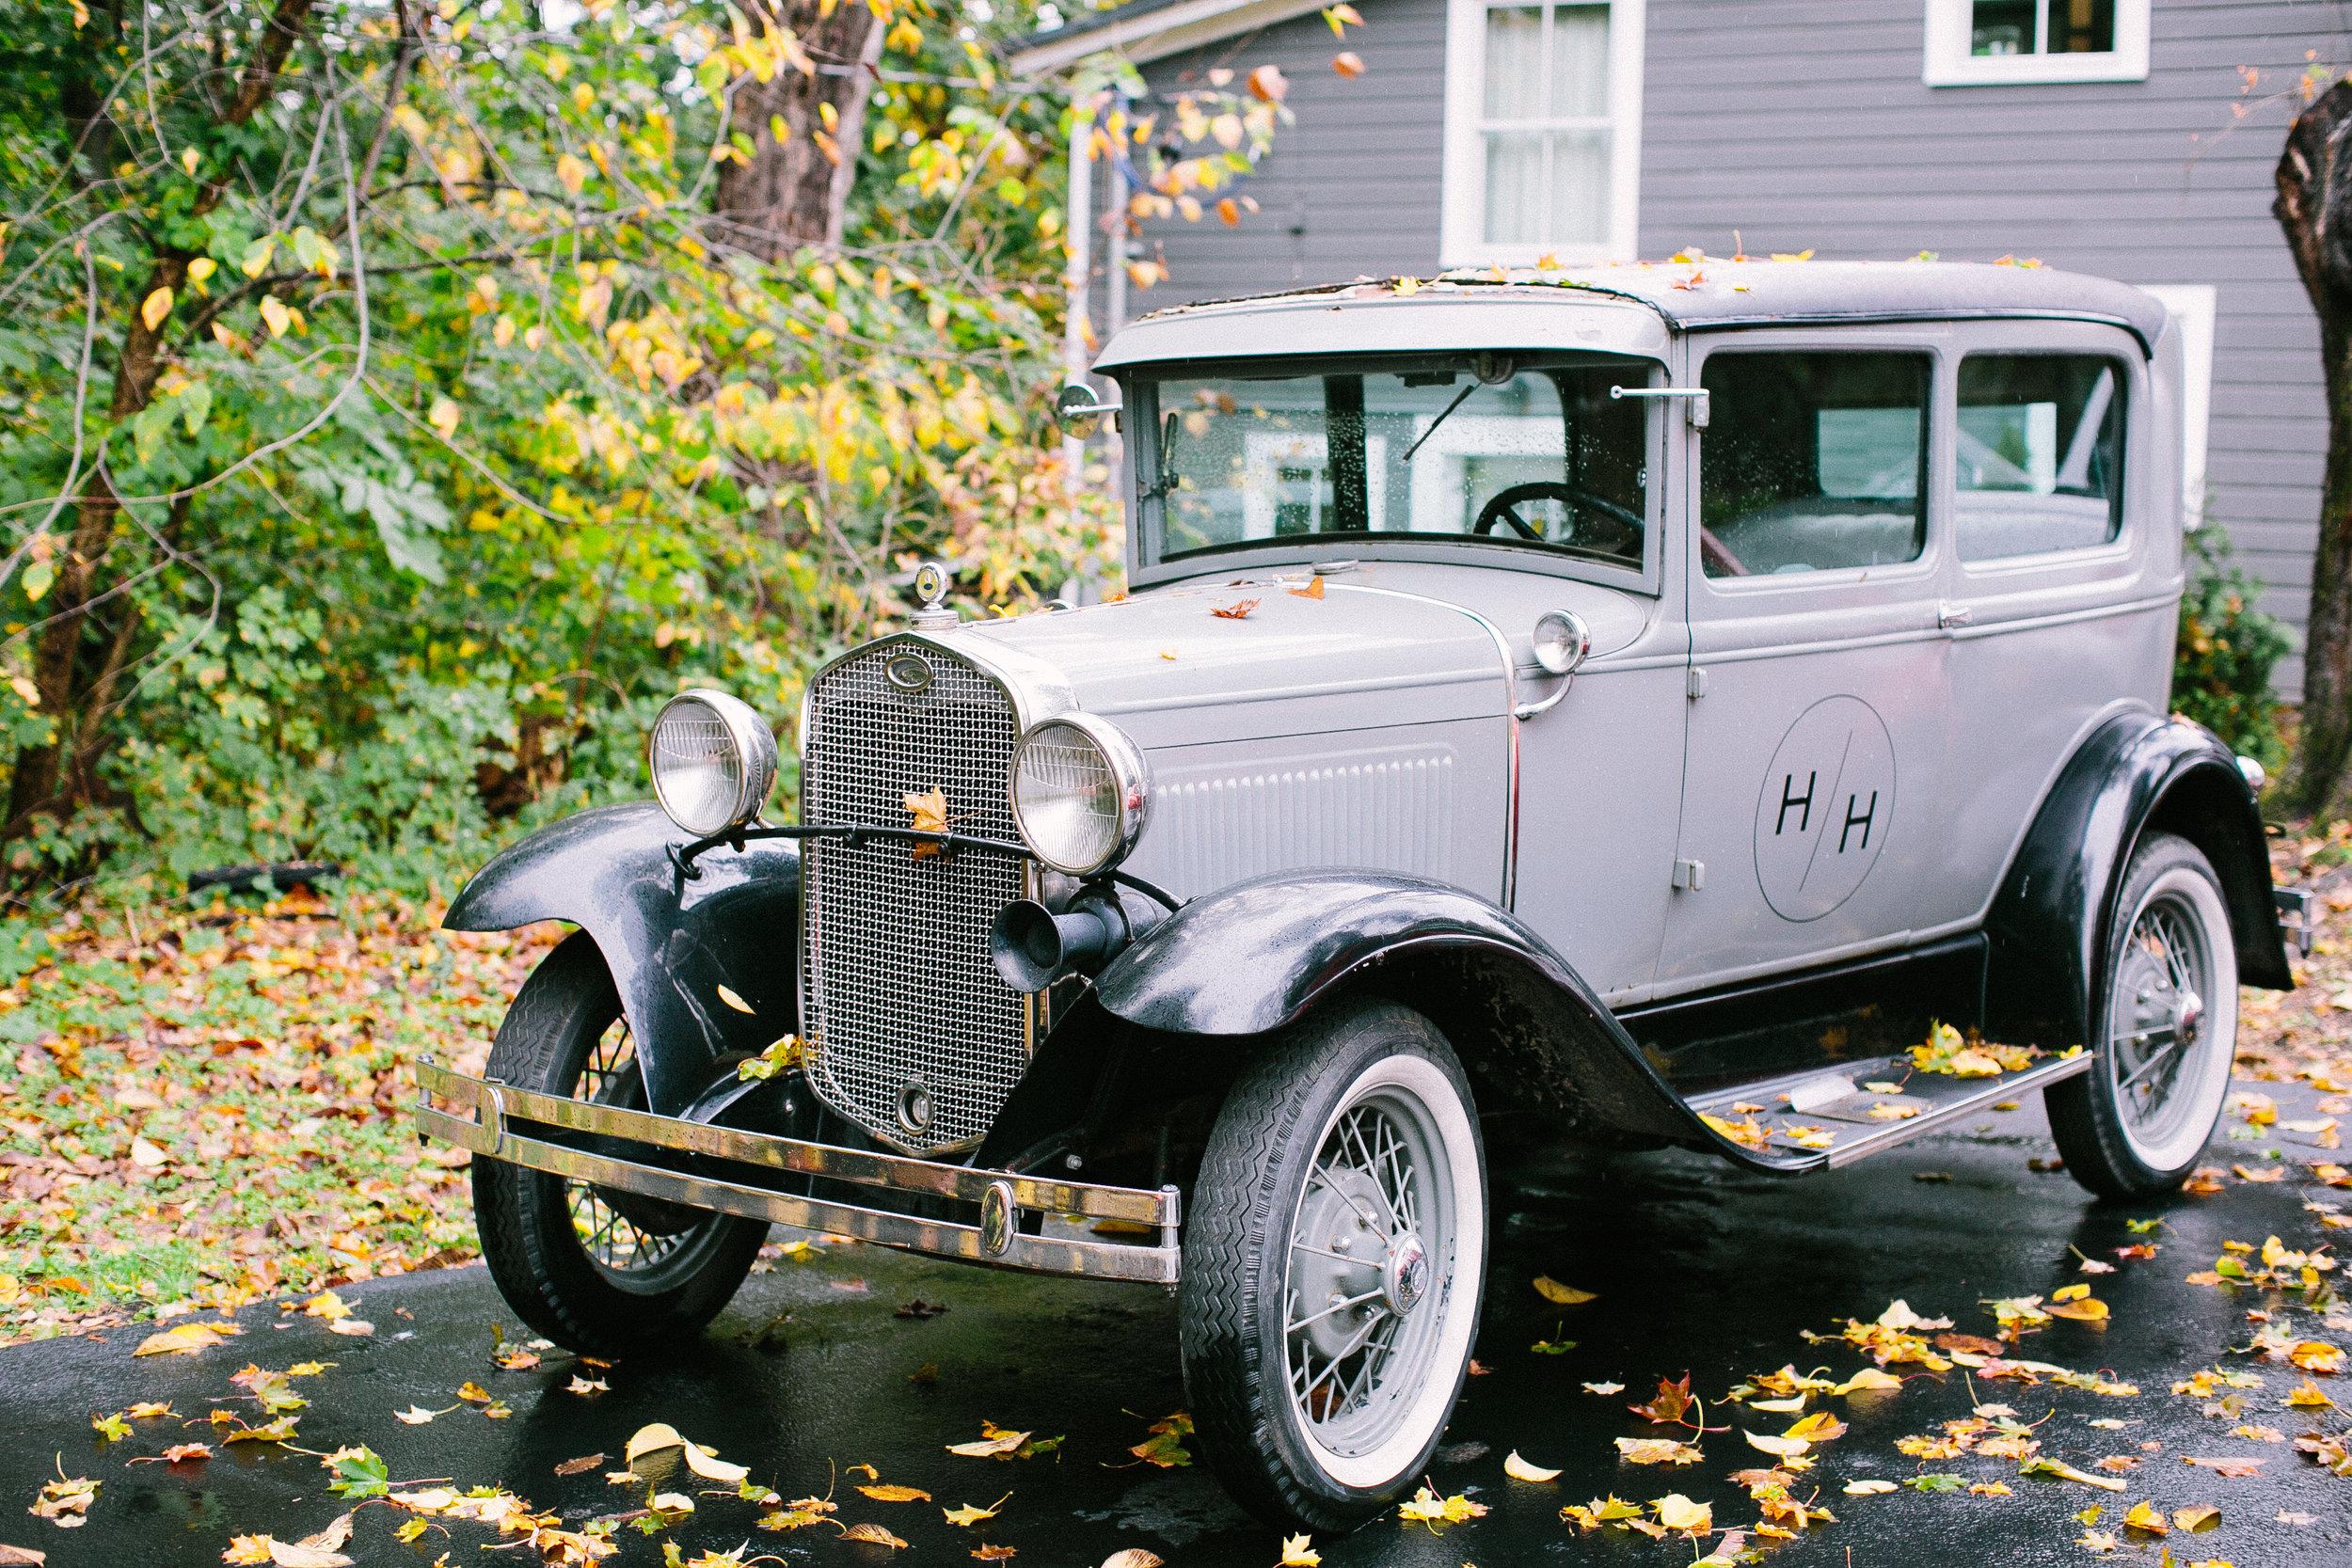 Vintage Car for Photo Opps